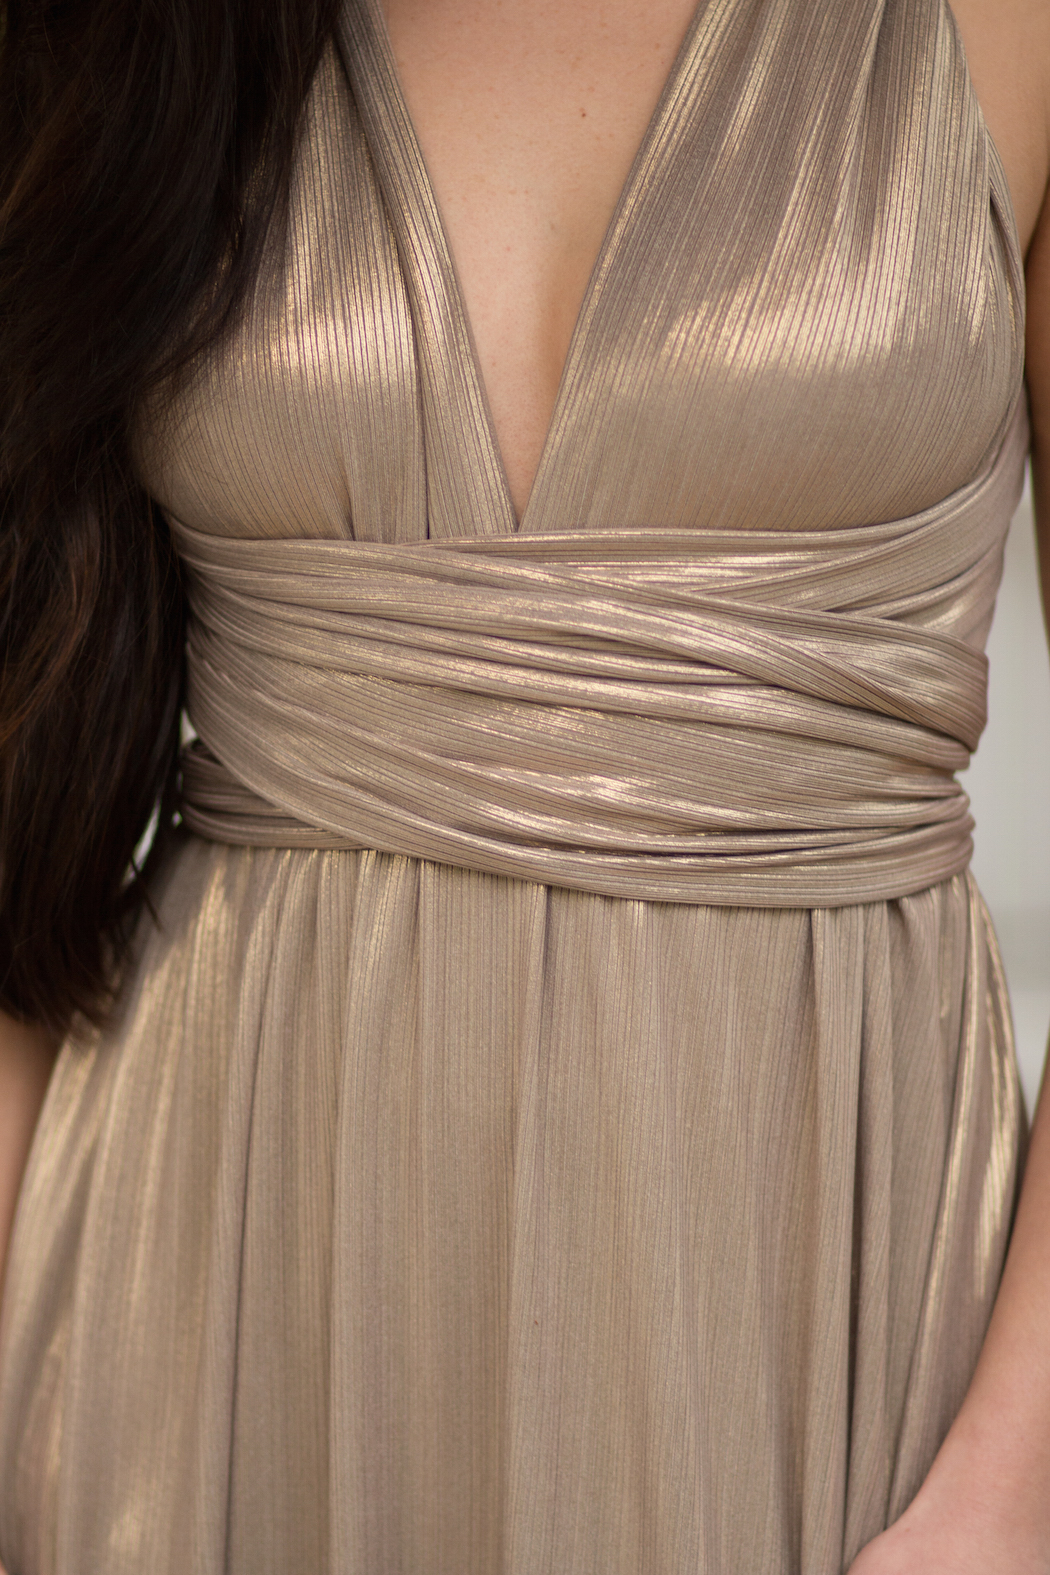 Lily V Designs Holiday Dress